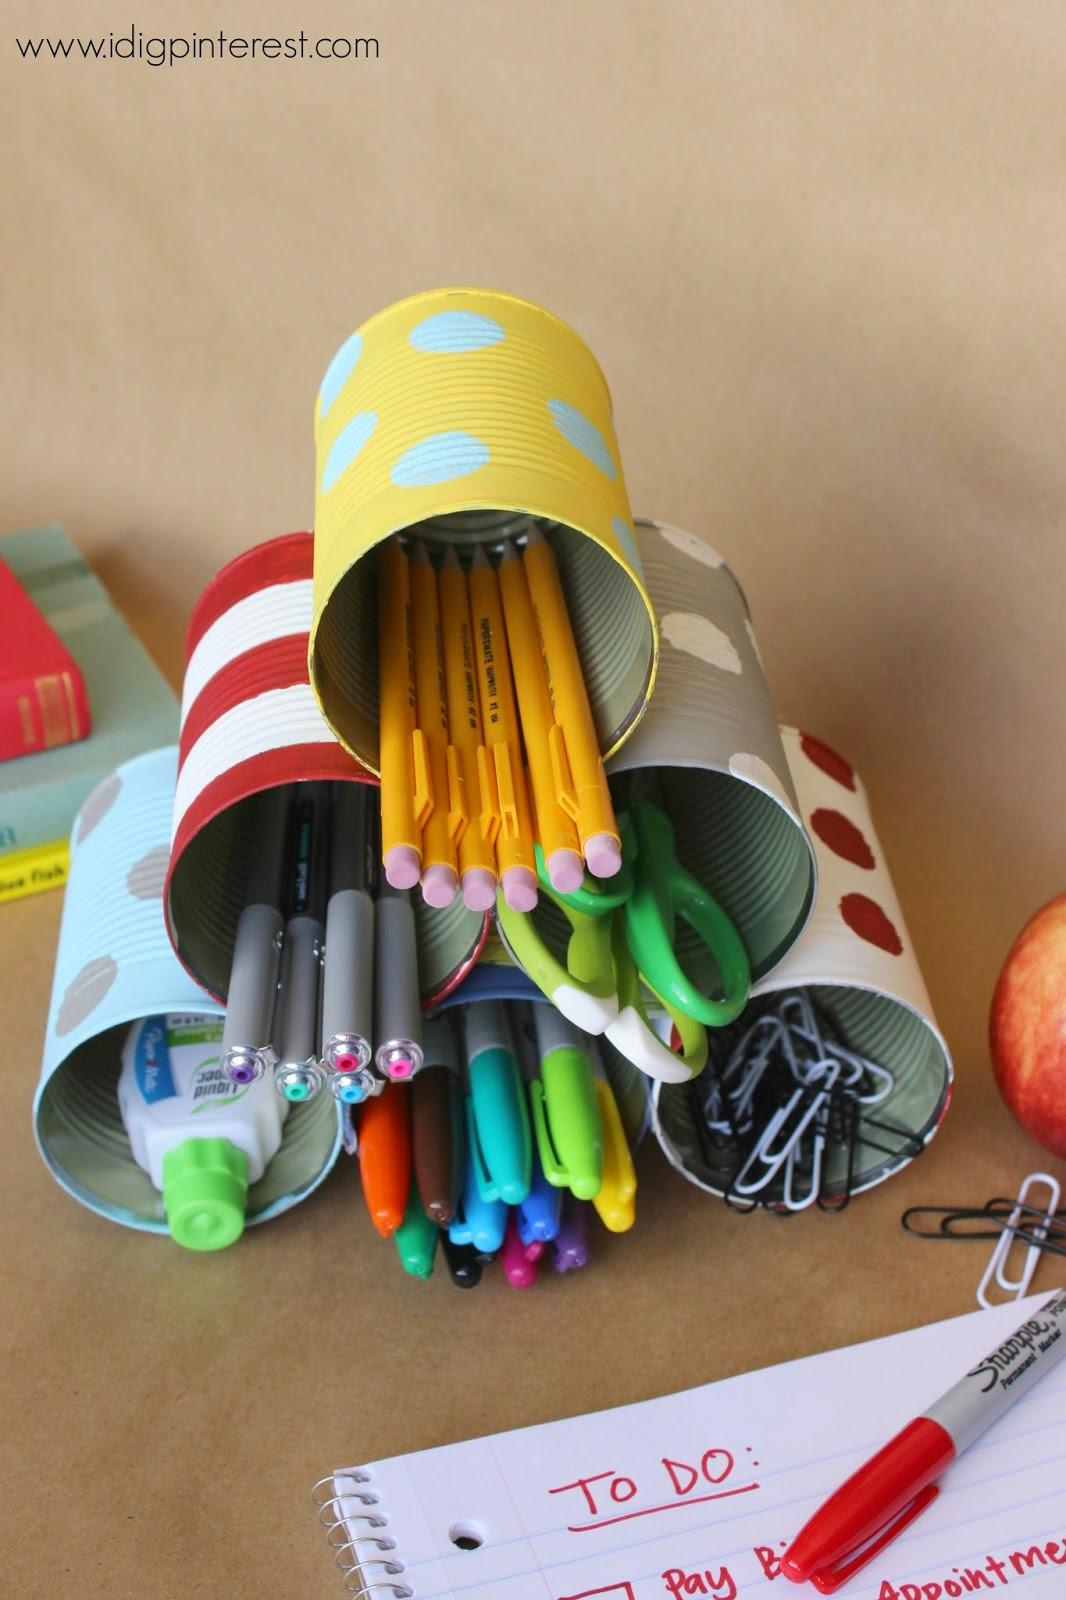 Diy Desk Organization  I Dig Pinterest DIY Tin Can Desk Supply Organizer